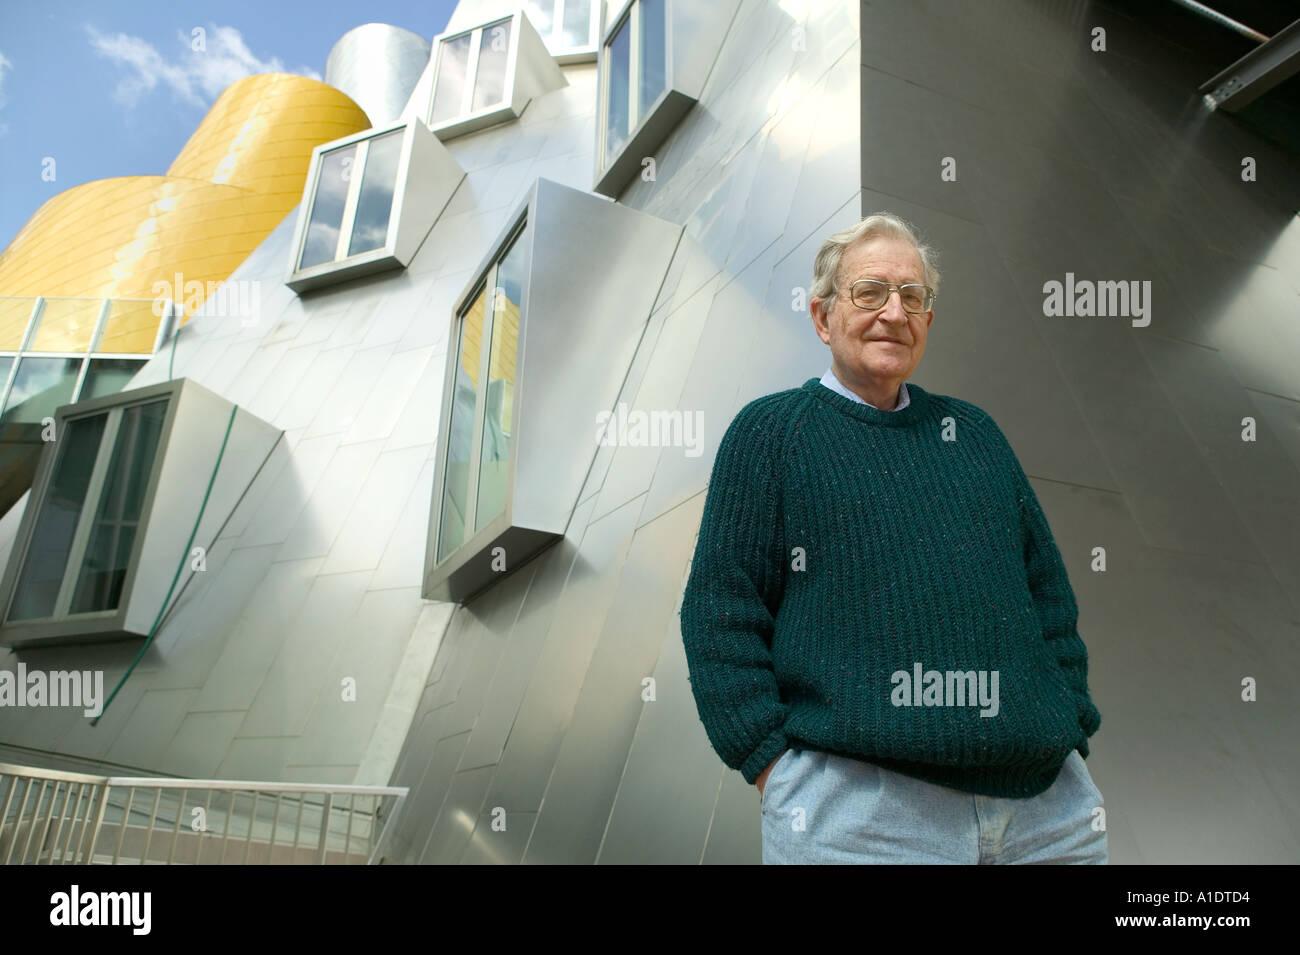 Noam Chomsky Professor of Linguistics at MIT Massachusetts Institute of Technology Stata Building - Stock Image